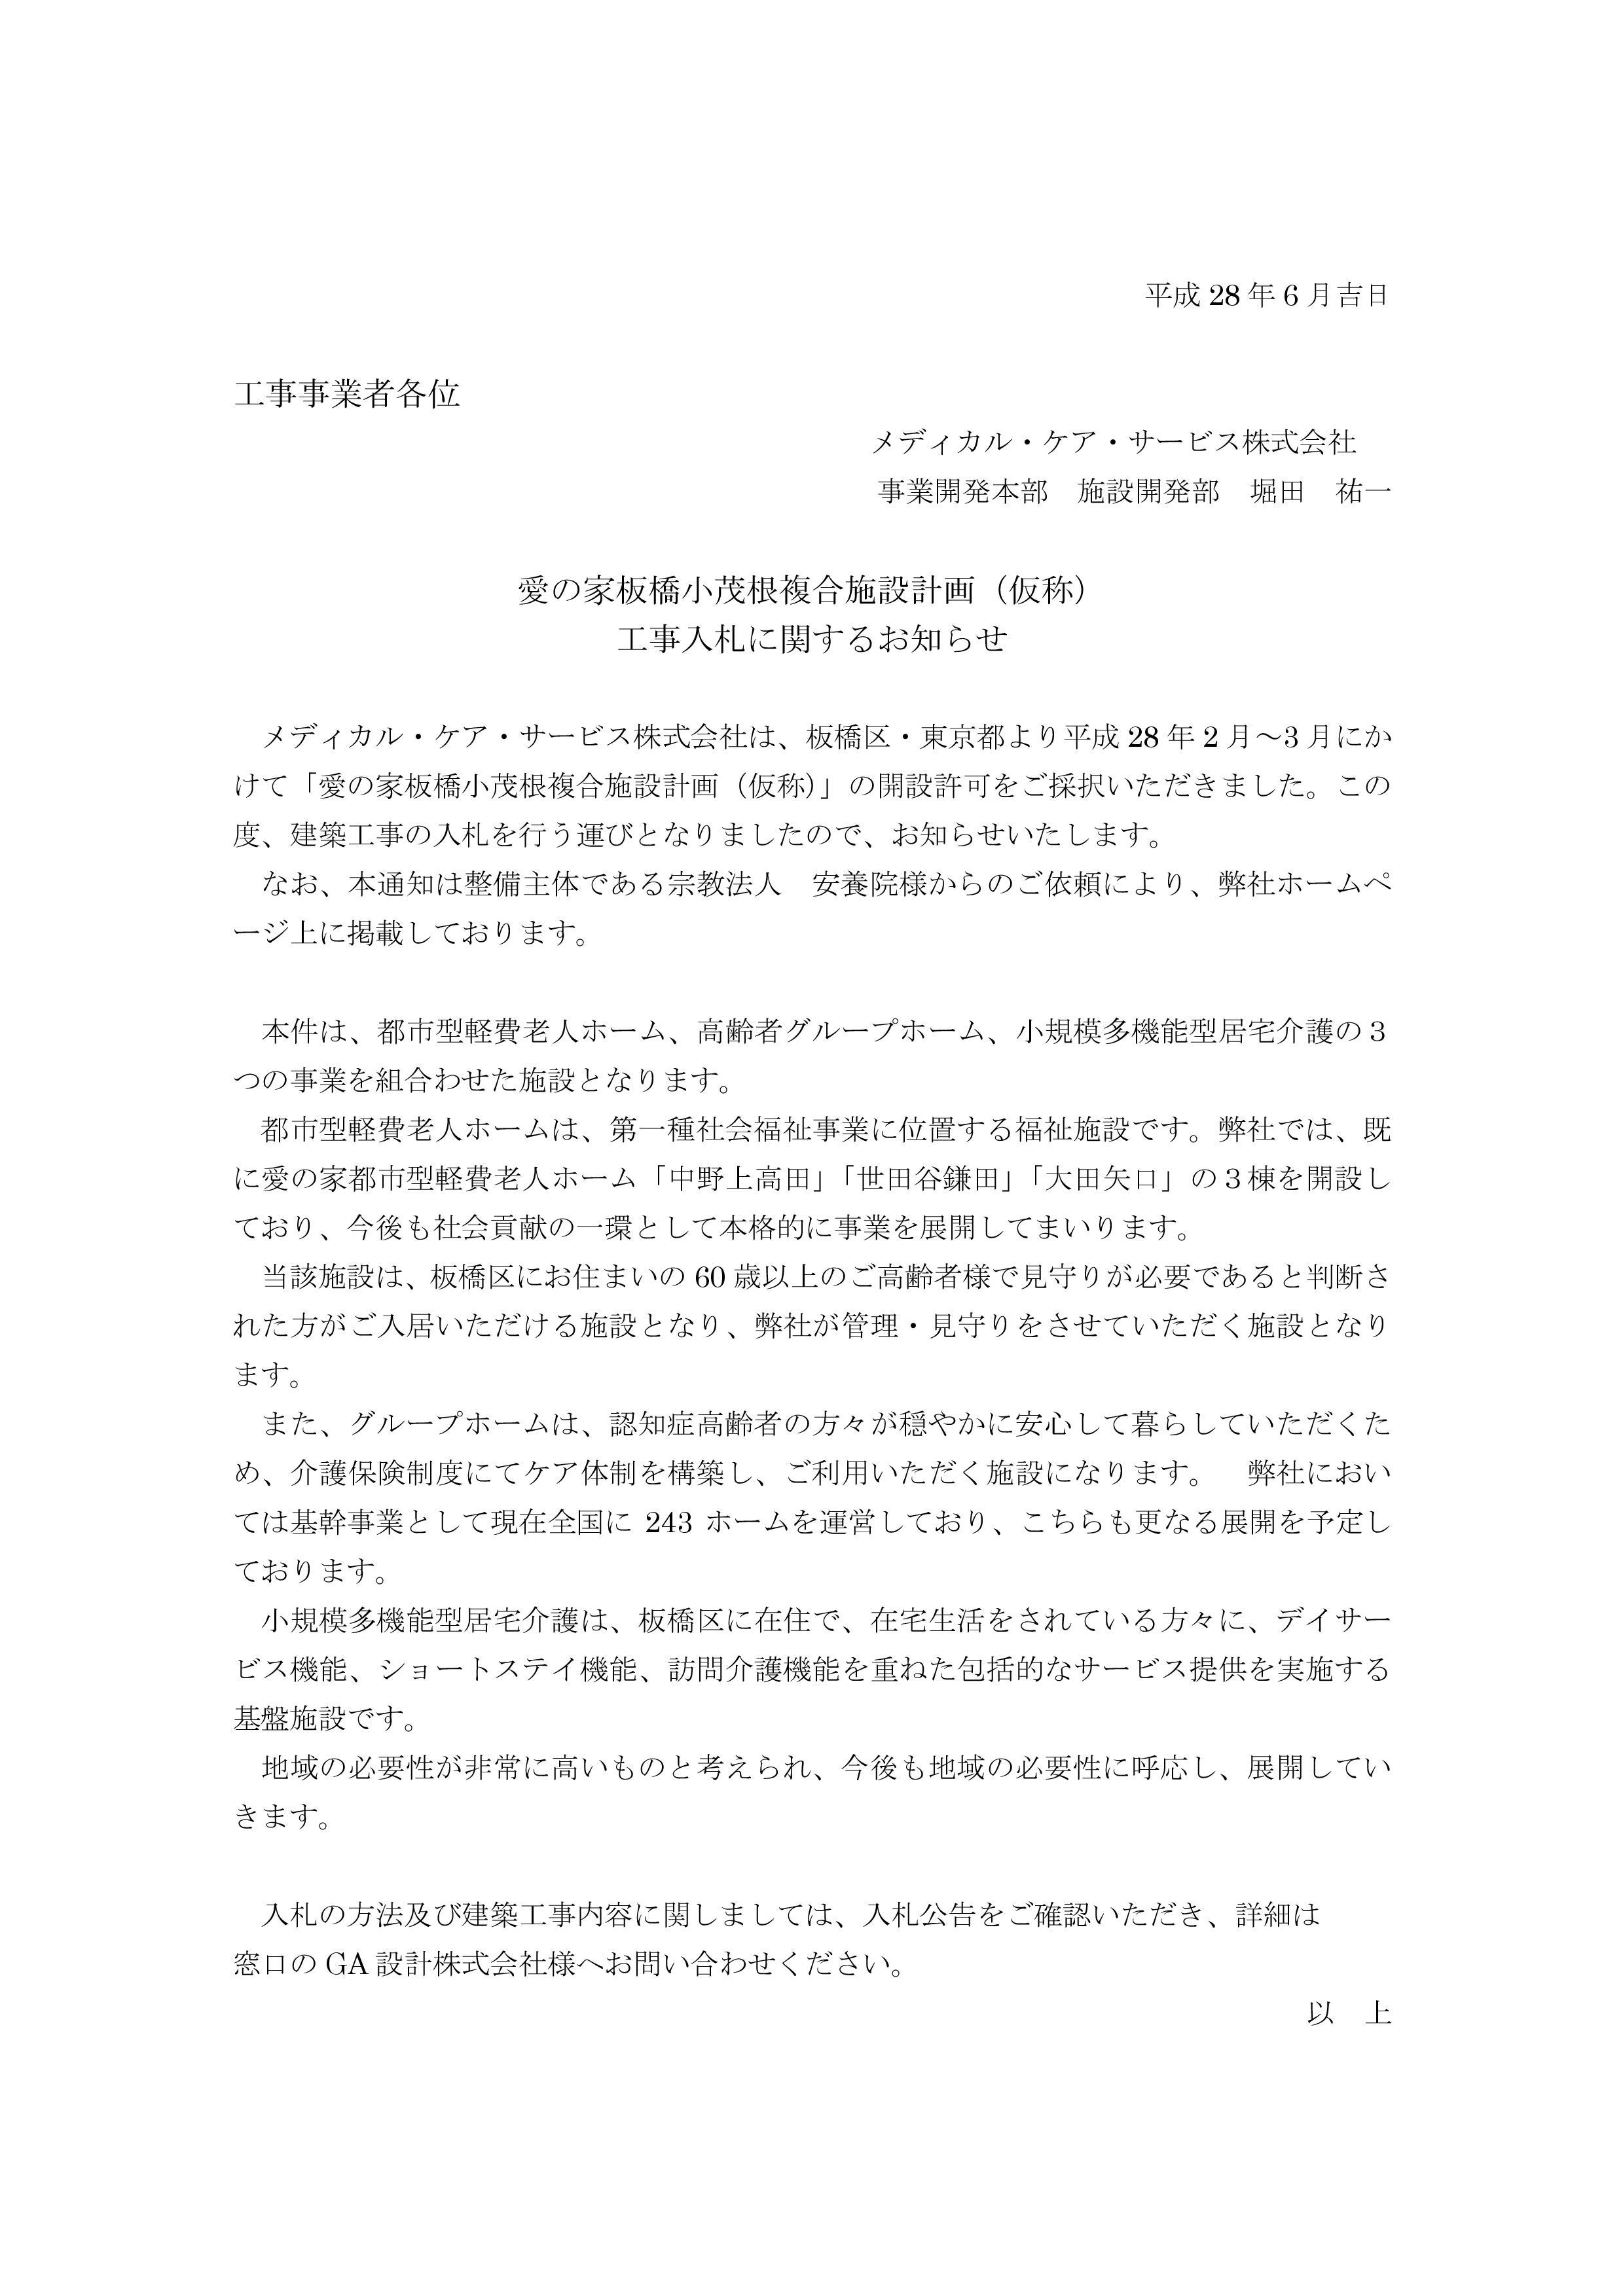 itabashikomone_1